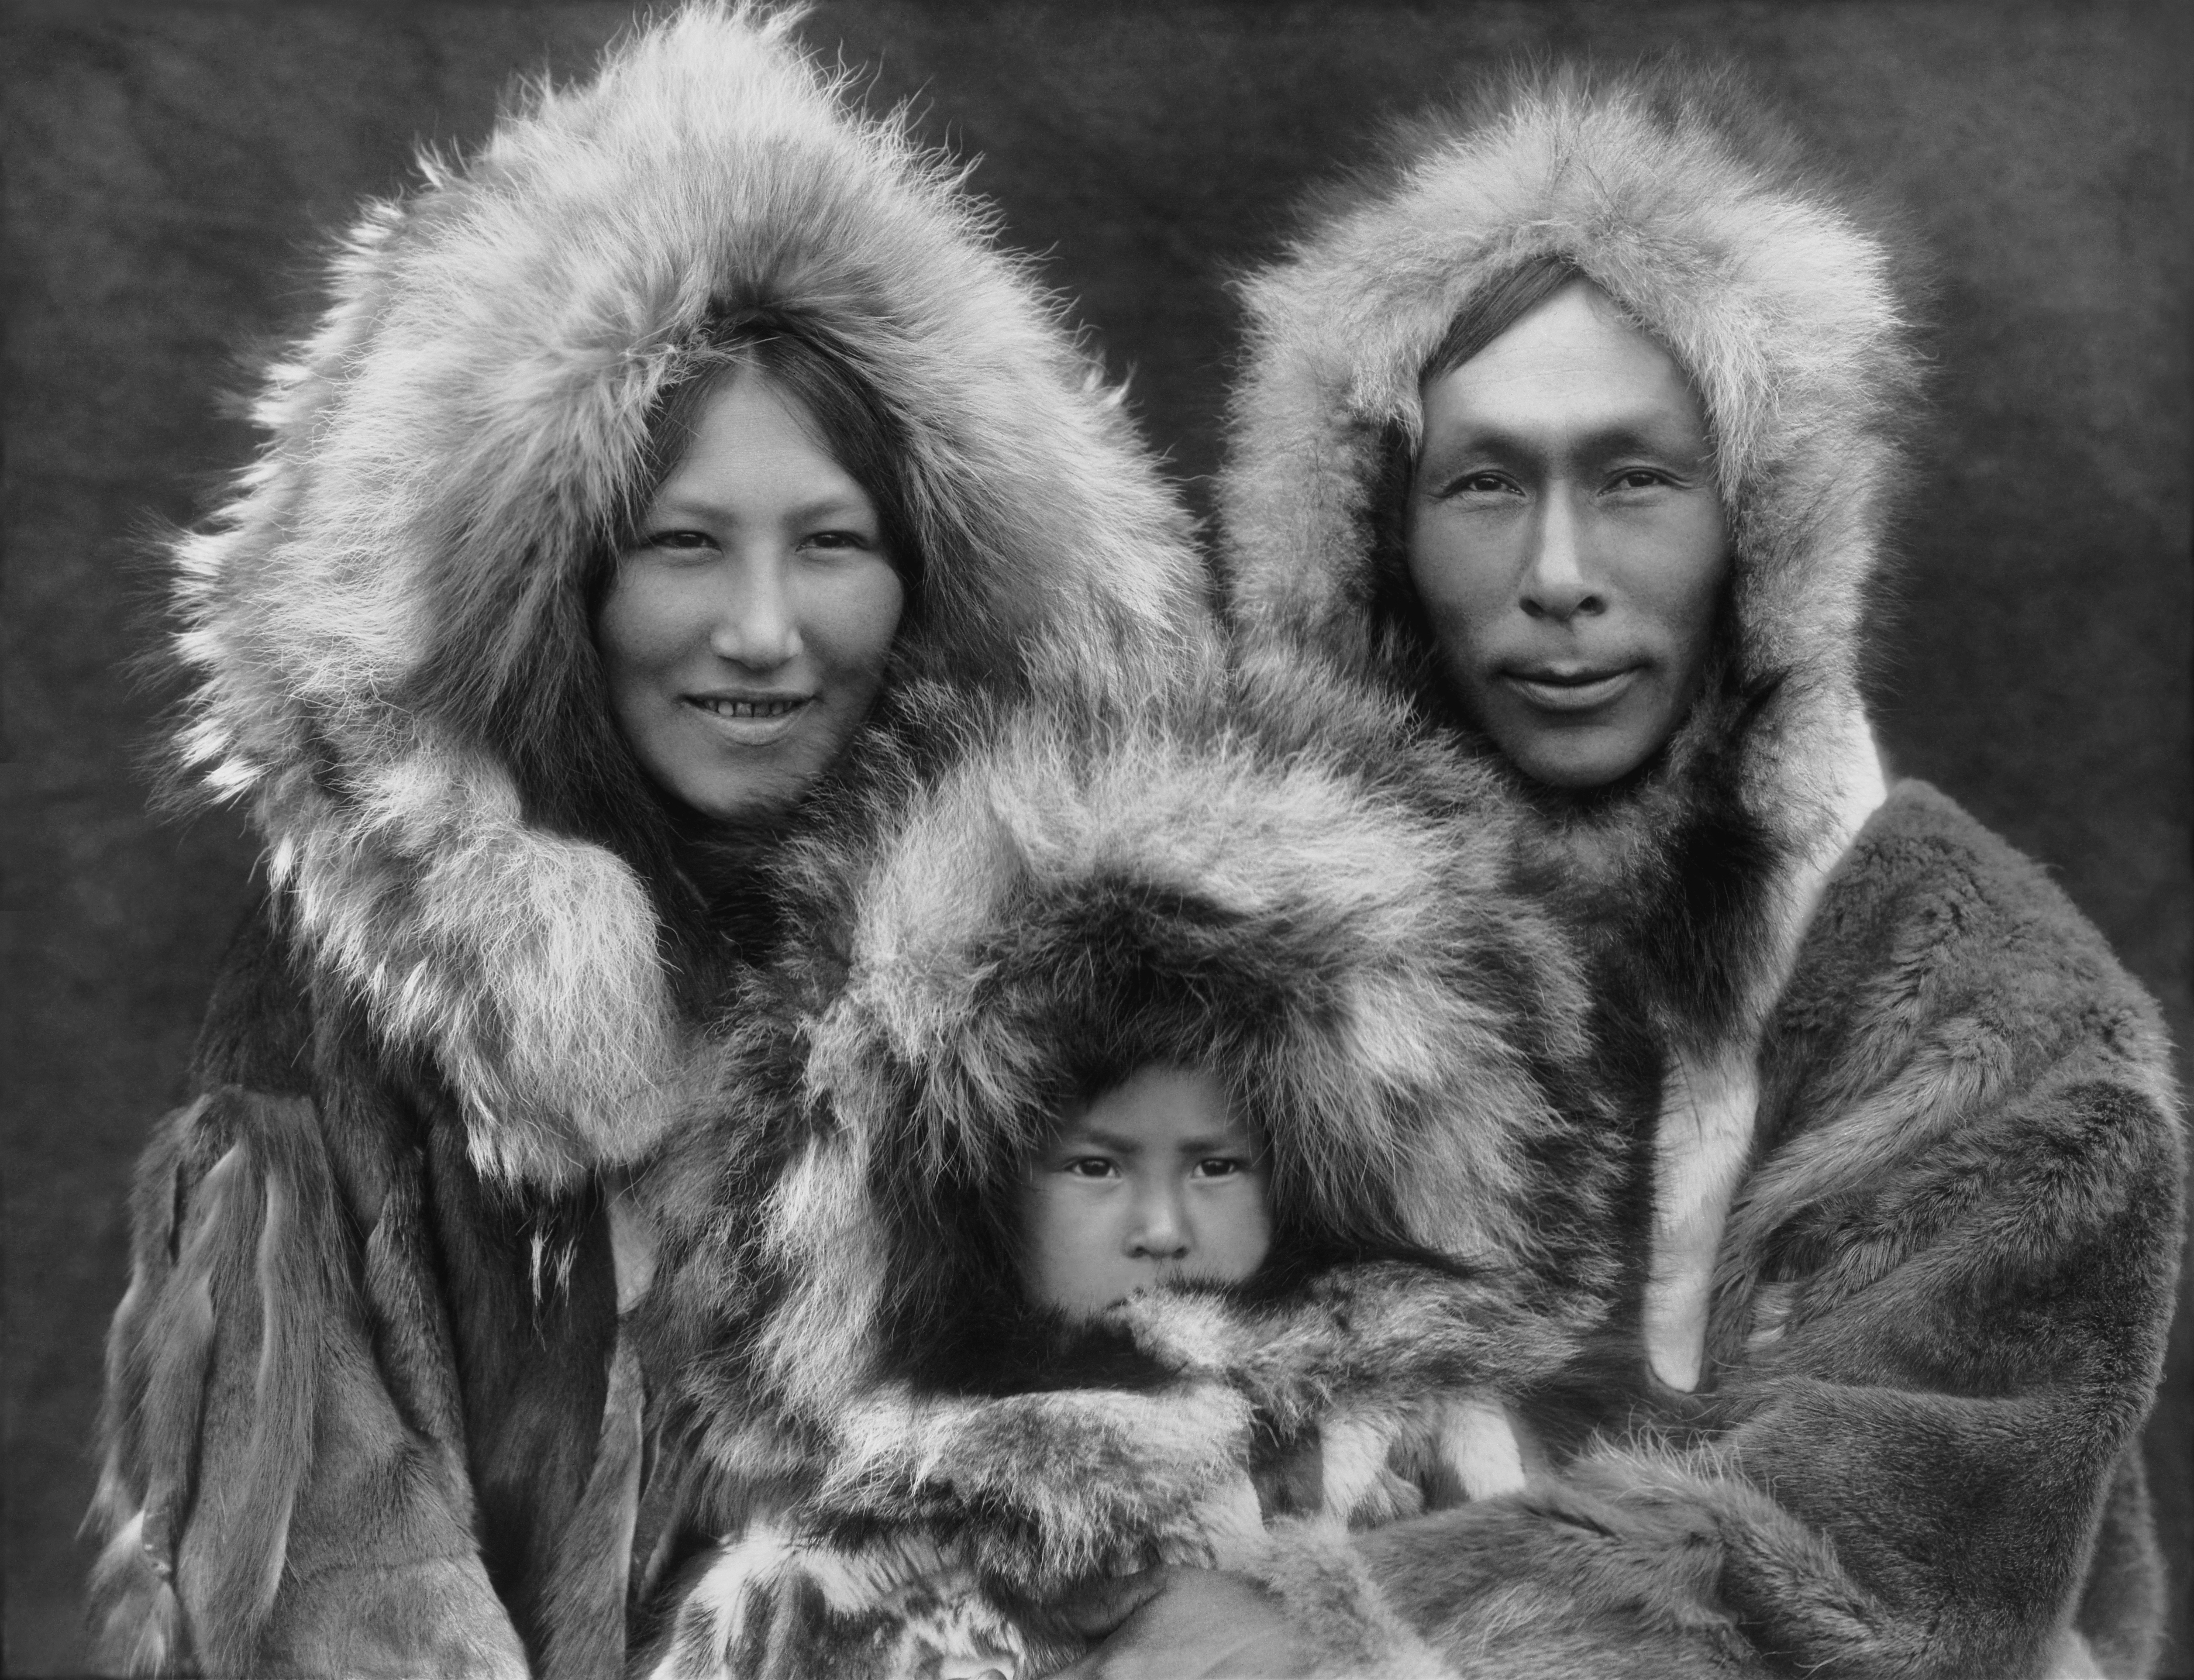 https://upload.wikimedia.org/wikipedia/commons/8/8c/Inupiat_Family_from_Noatak,_Alaska,_1929,_Edward_S._Curtis_(restored).jpg